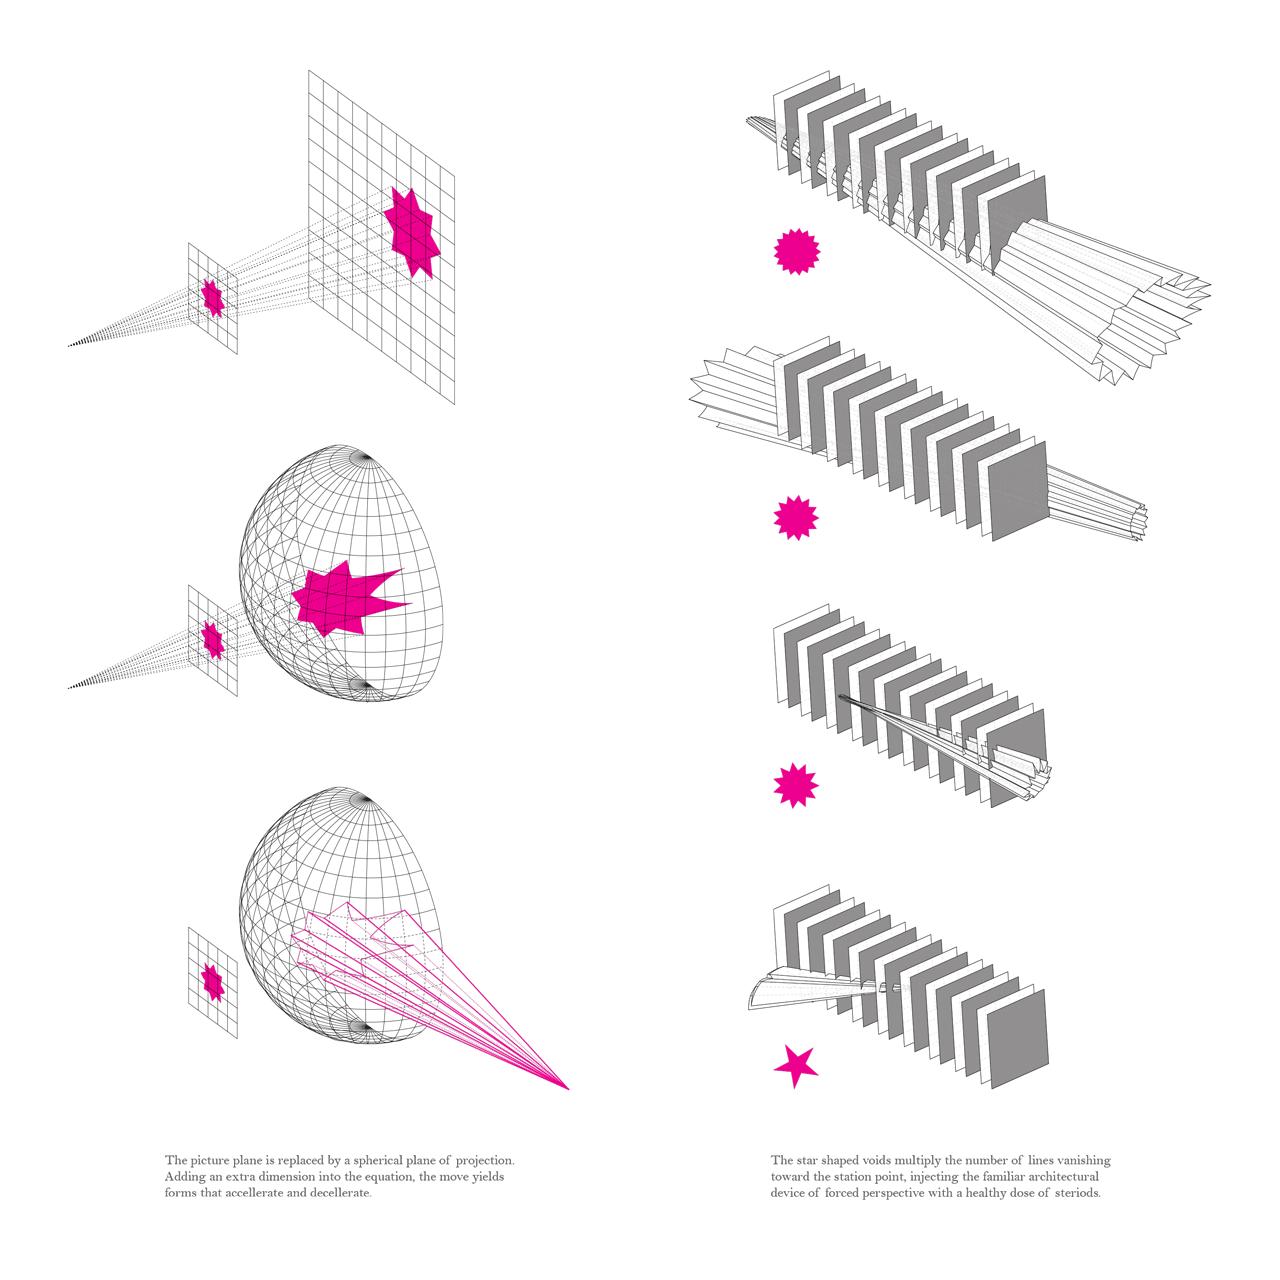 steven-christensen_spatial-ops_the-beta-movement_diagram_1_1280.png